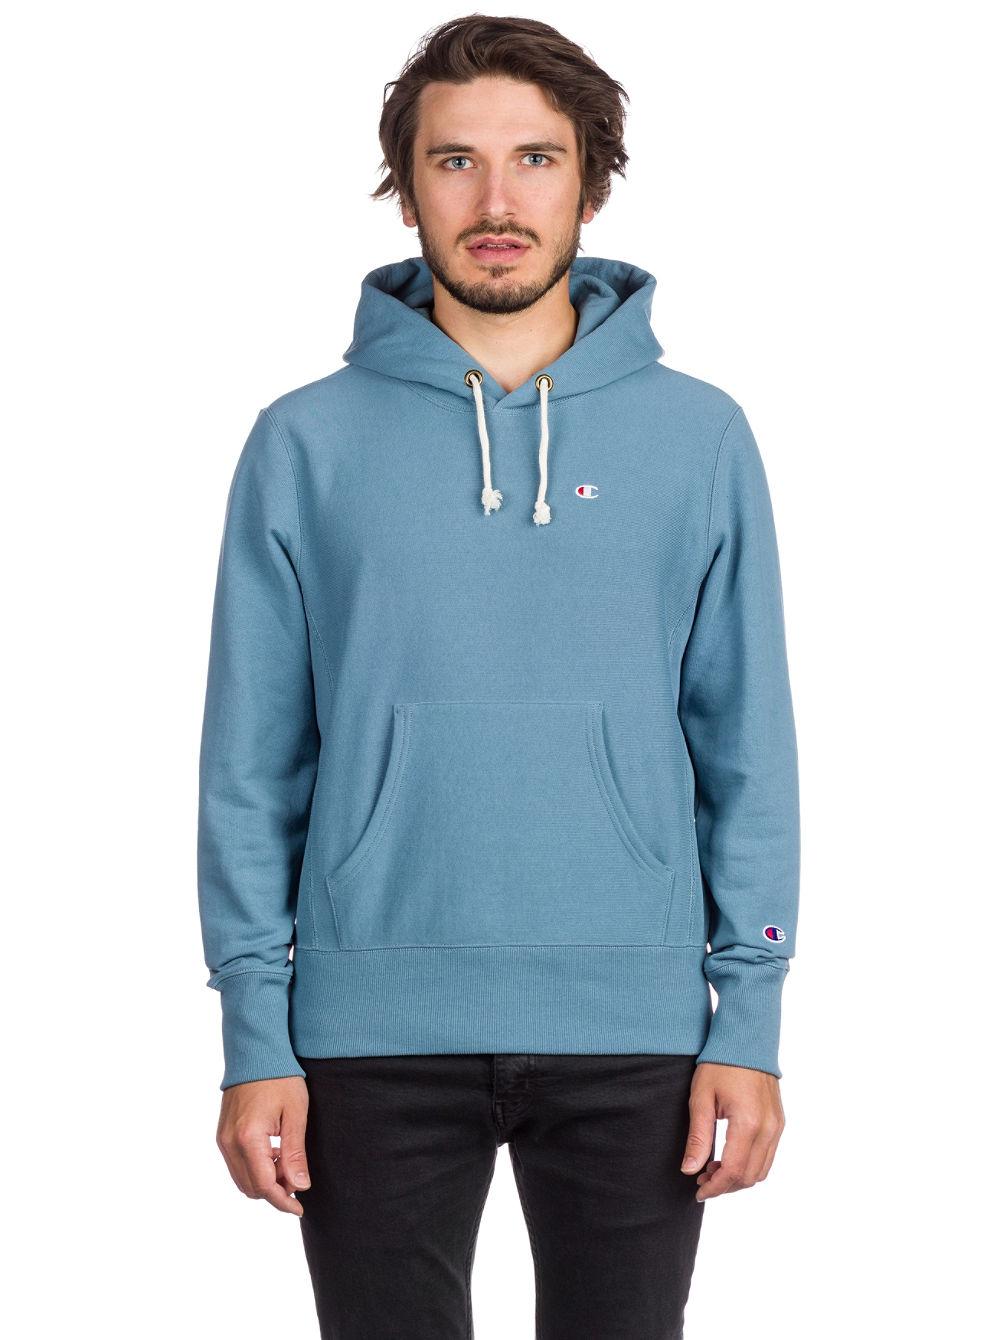 low priced ede7b 7aa1f Hooded Sweatshirt Felpa con Cappuccio